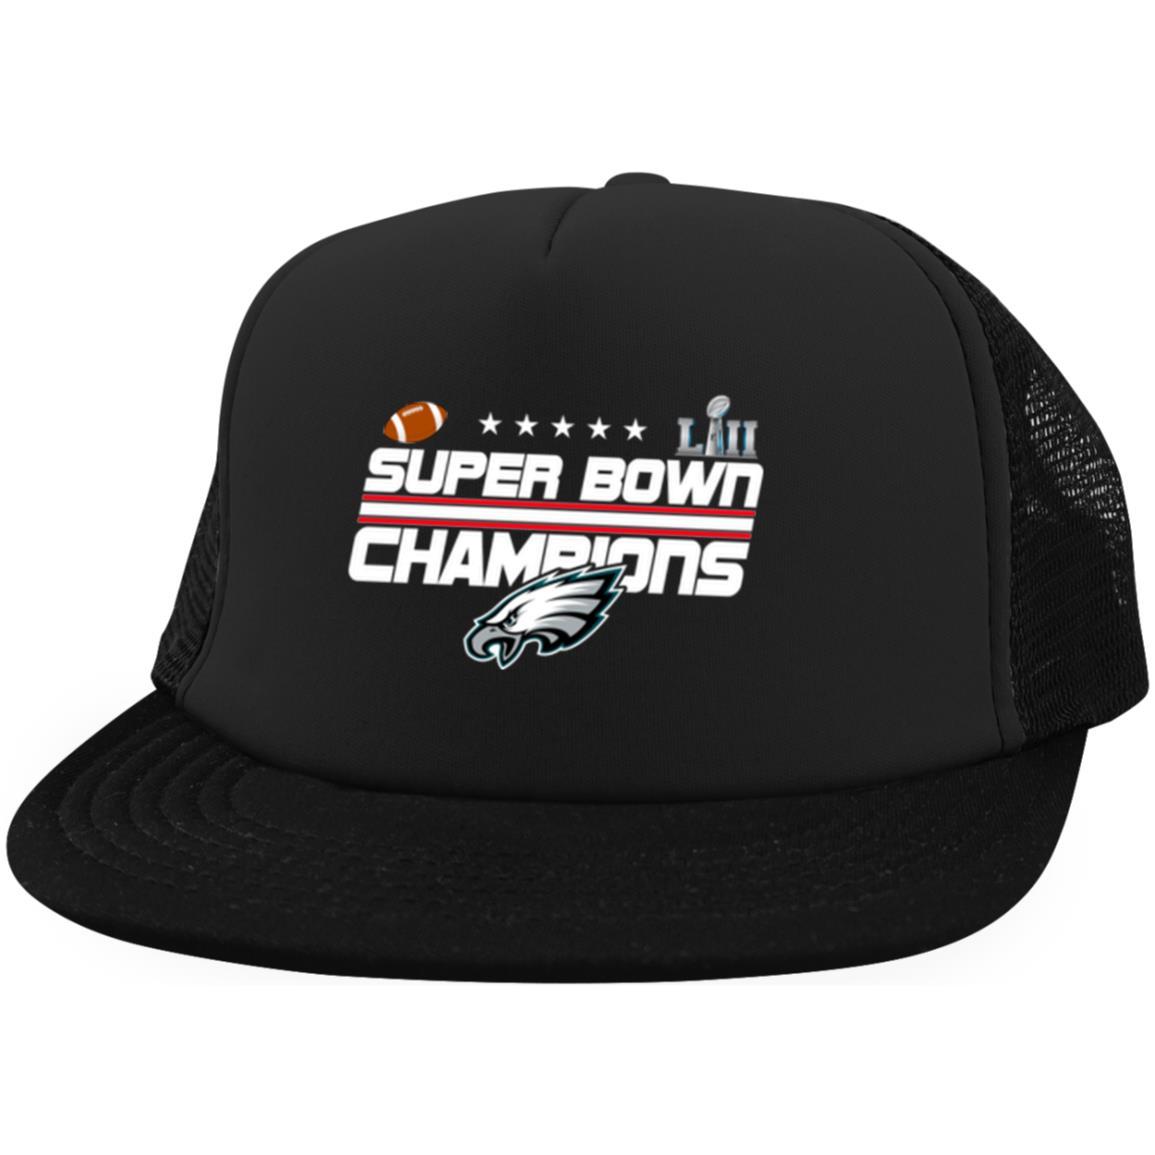 image 258 - Eagles Super Bowl Champions Hats